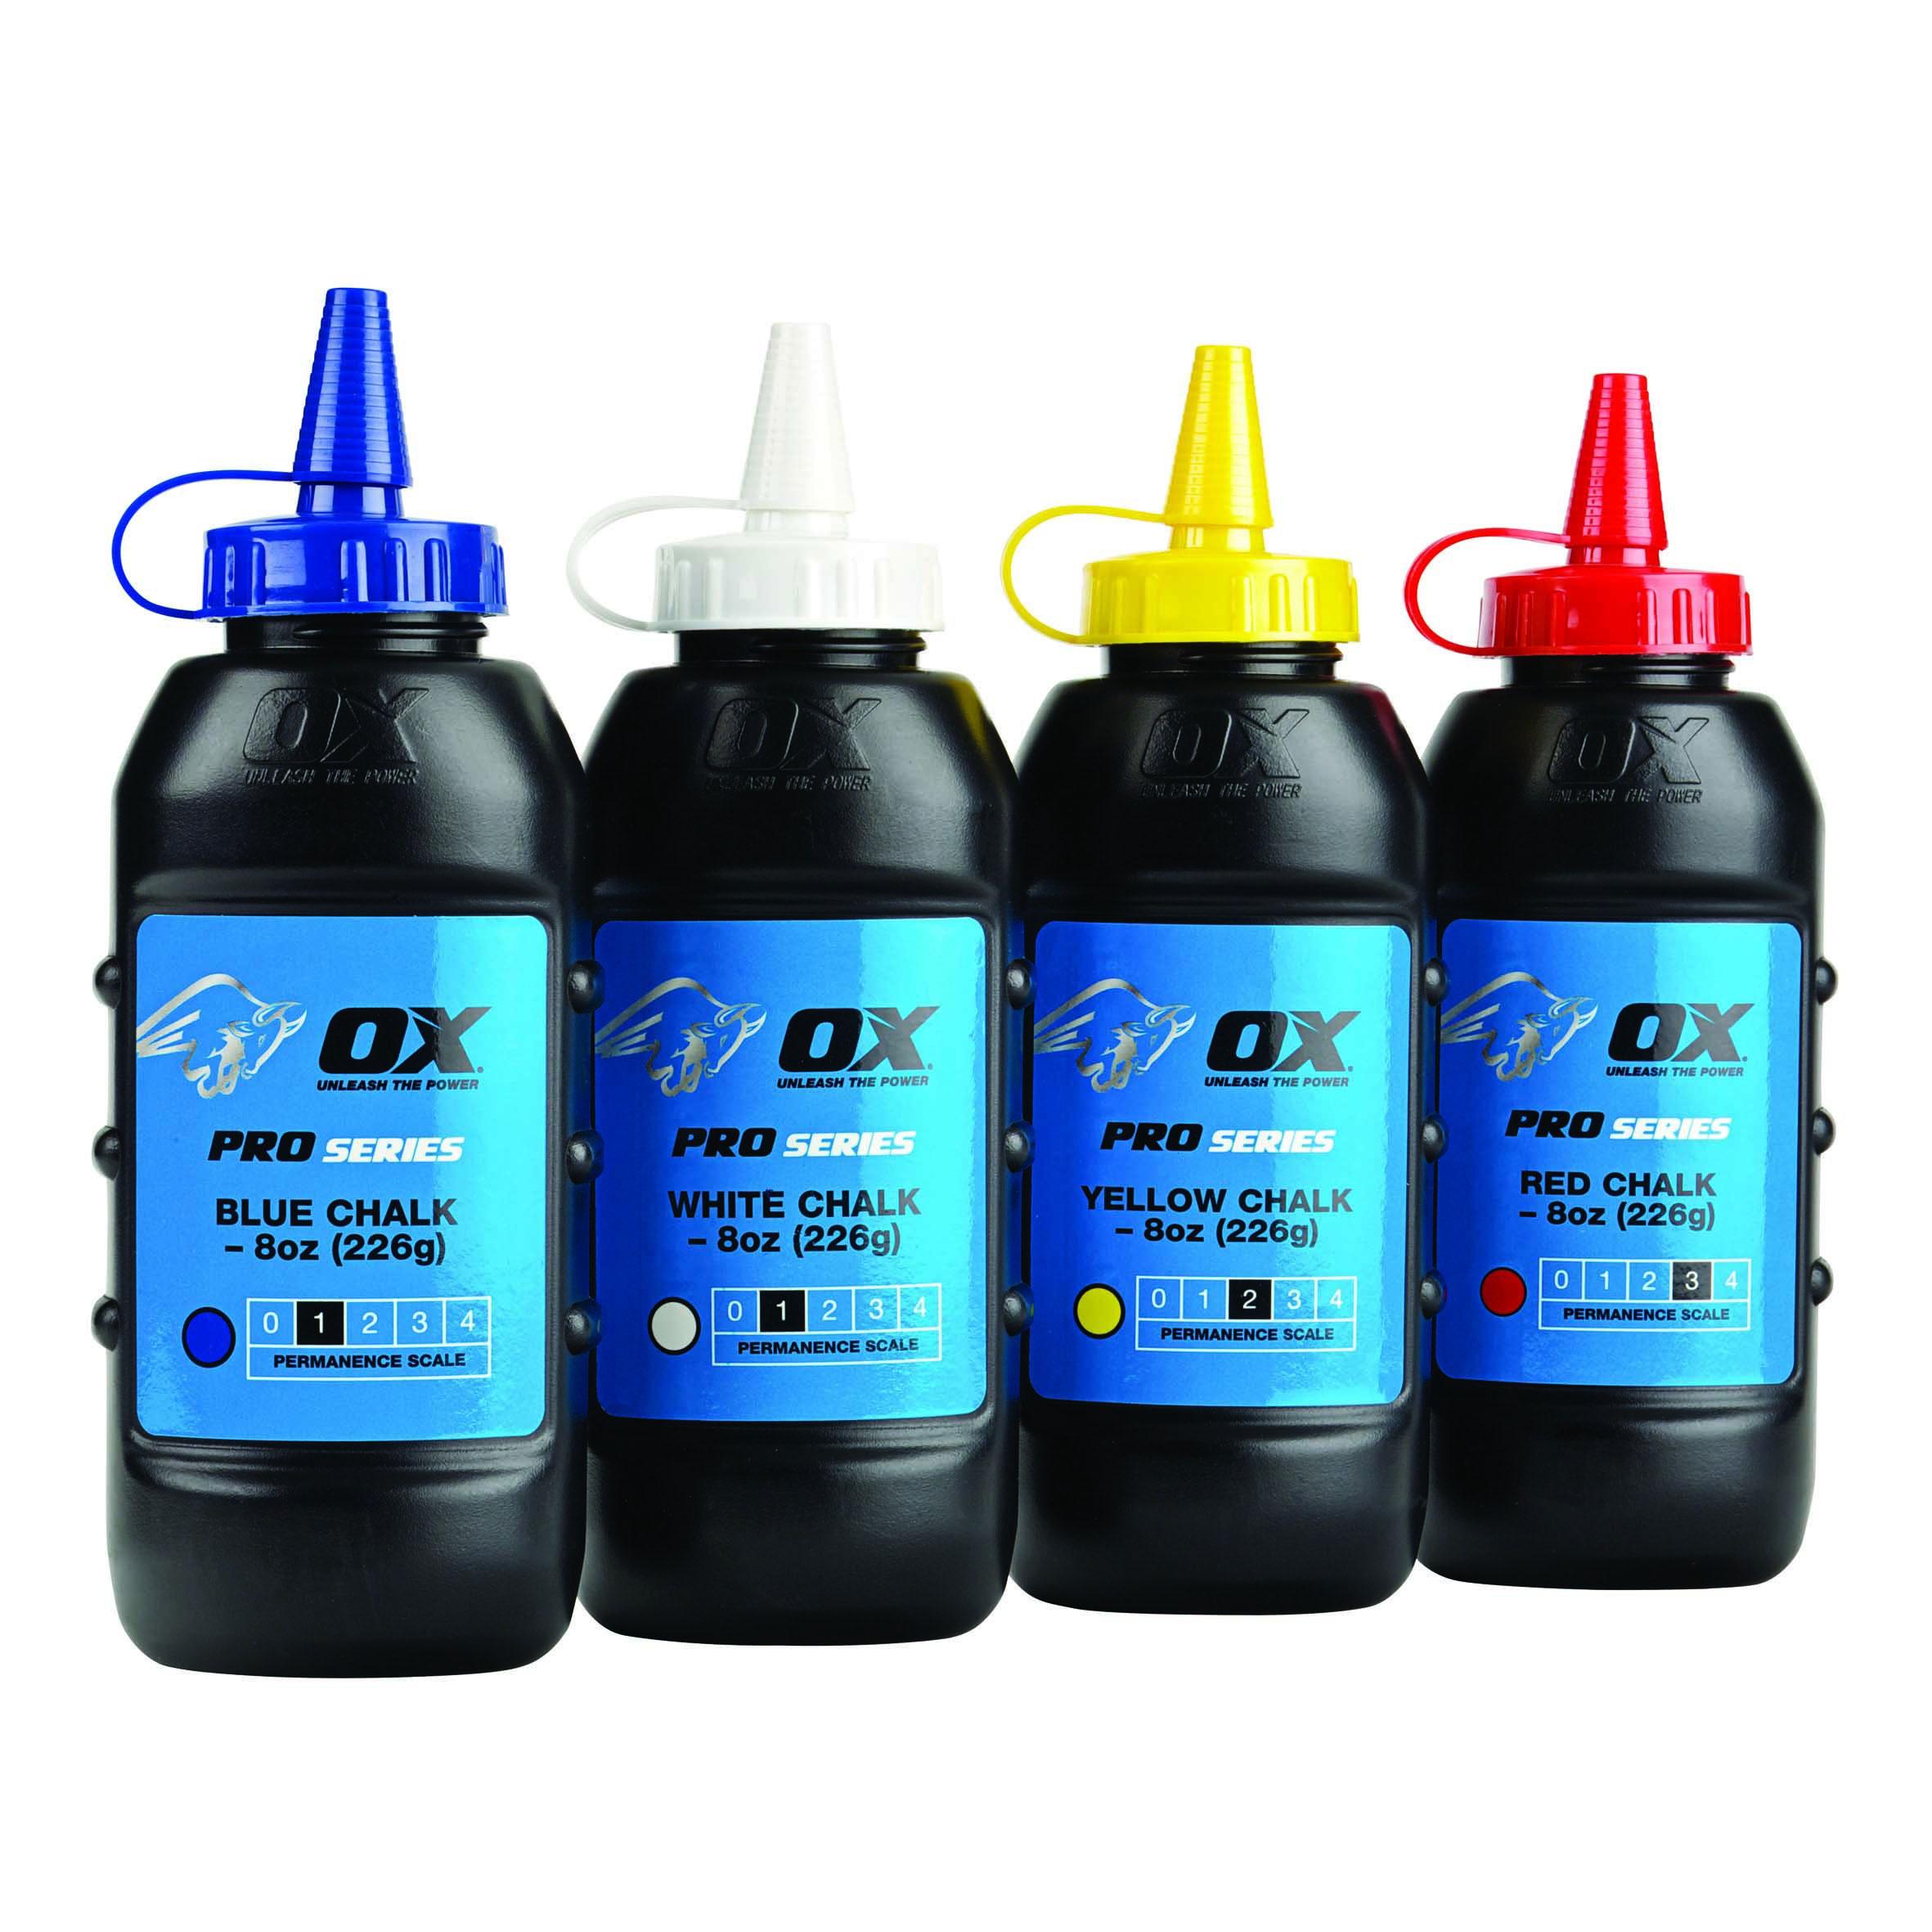 Snörslåkrita OX Tools 226gr